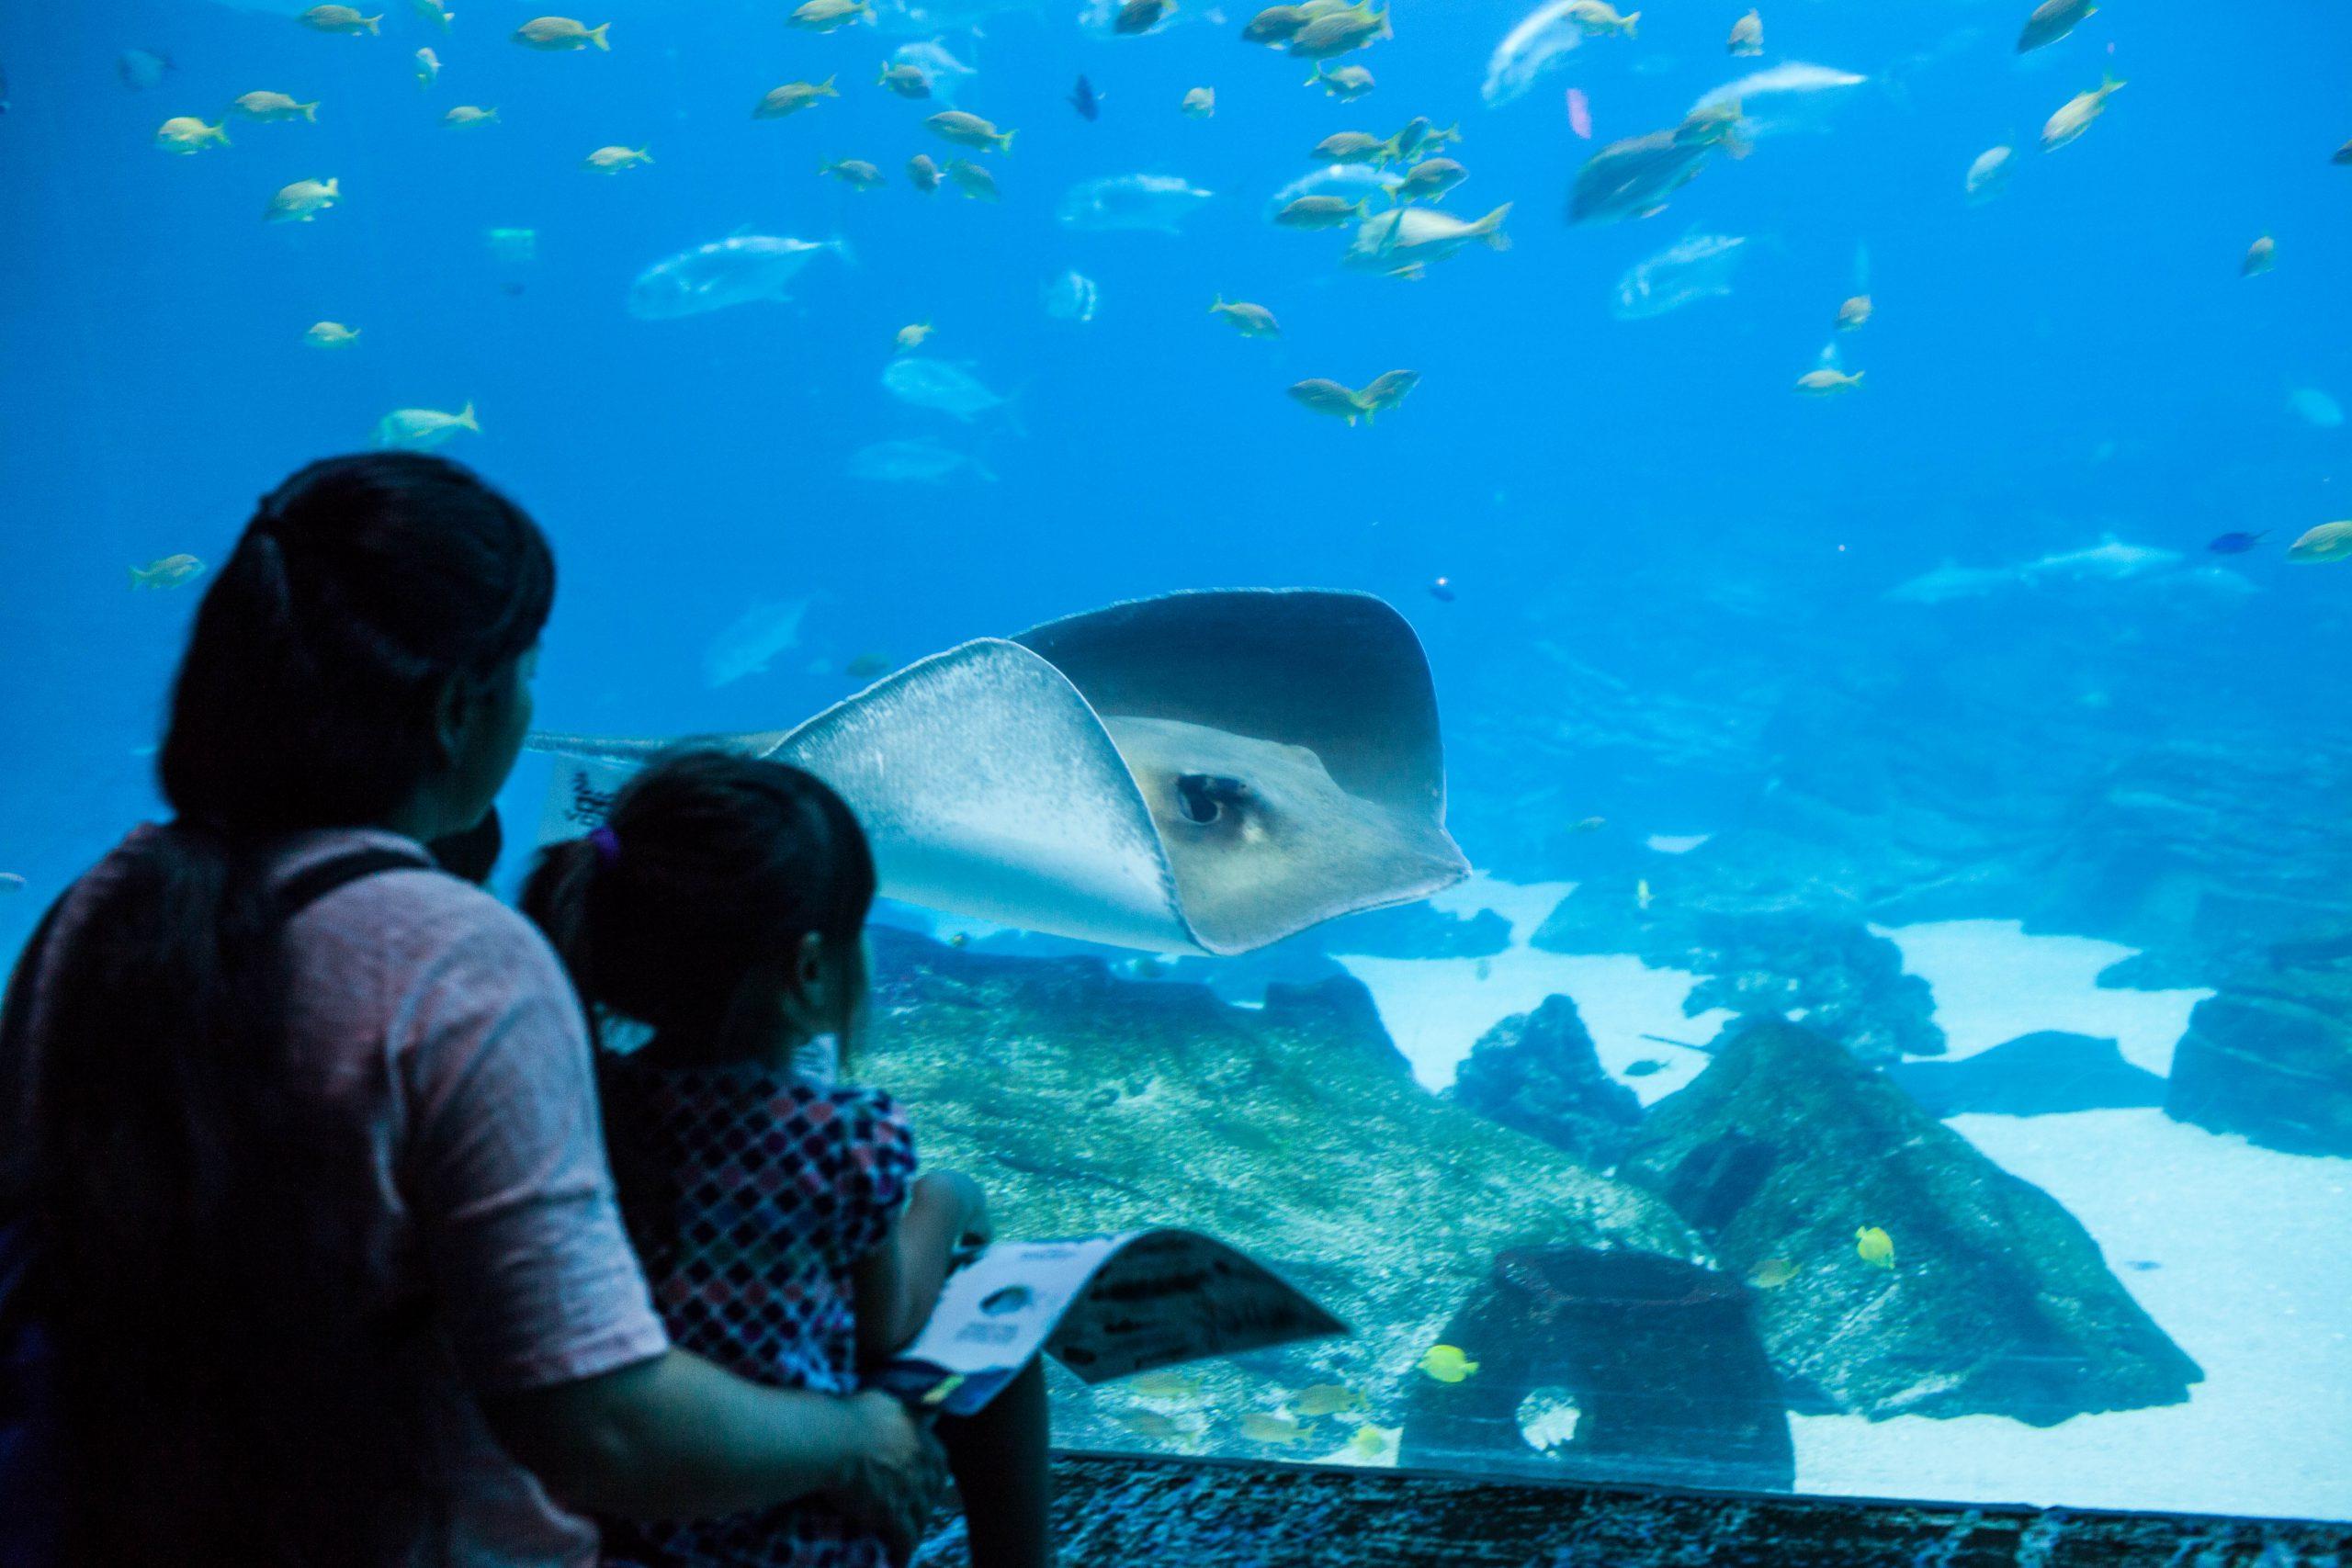 Dive in without getting wet at Georgia Aquarium in Atlanta